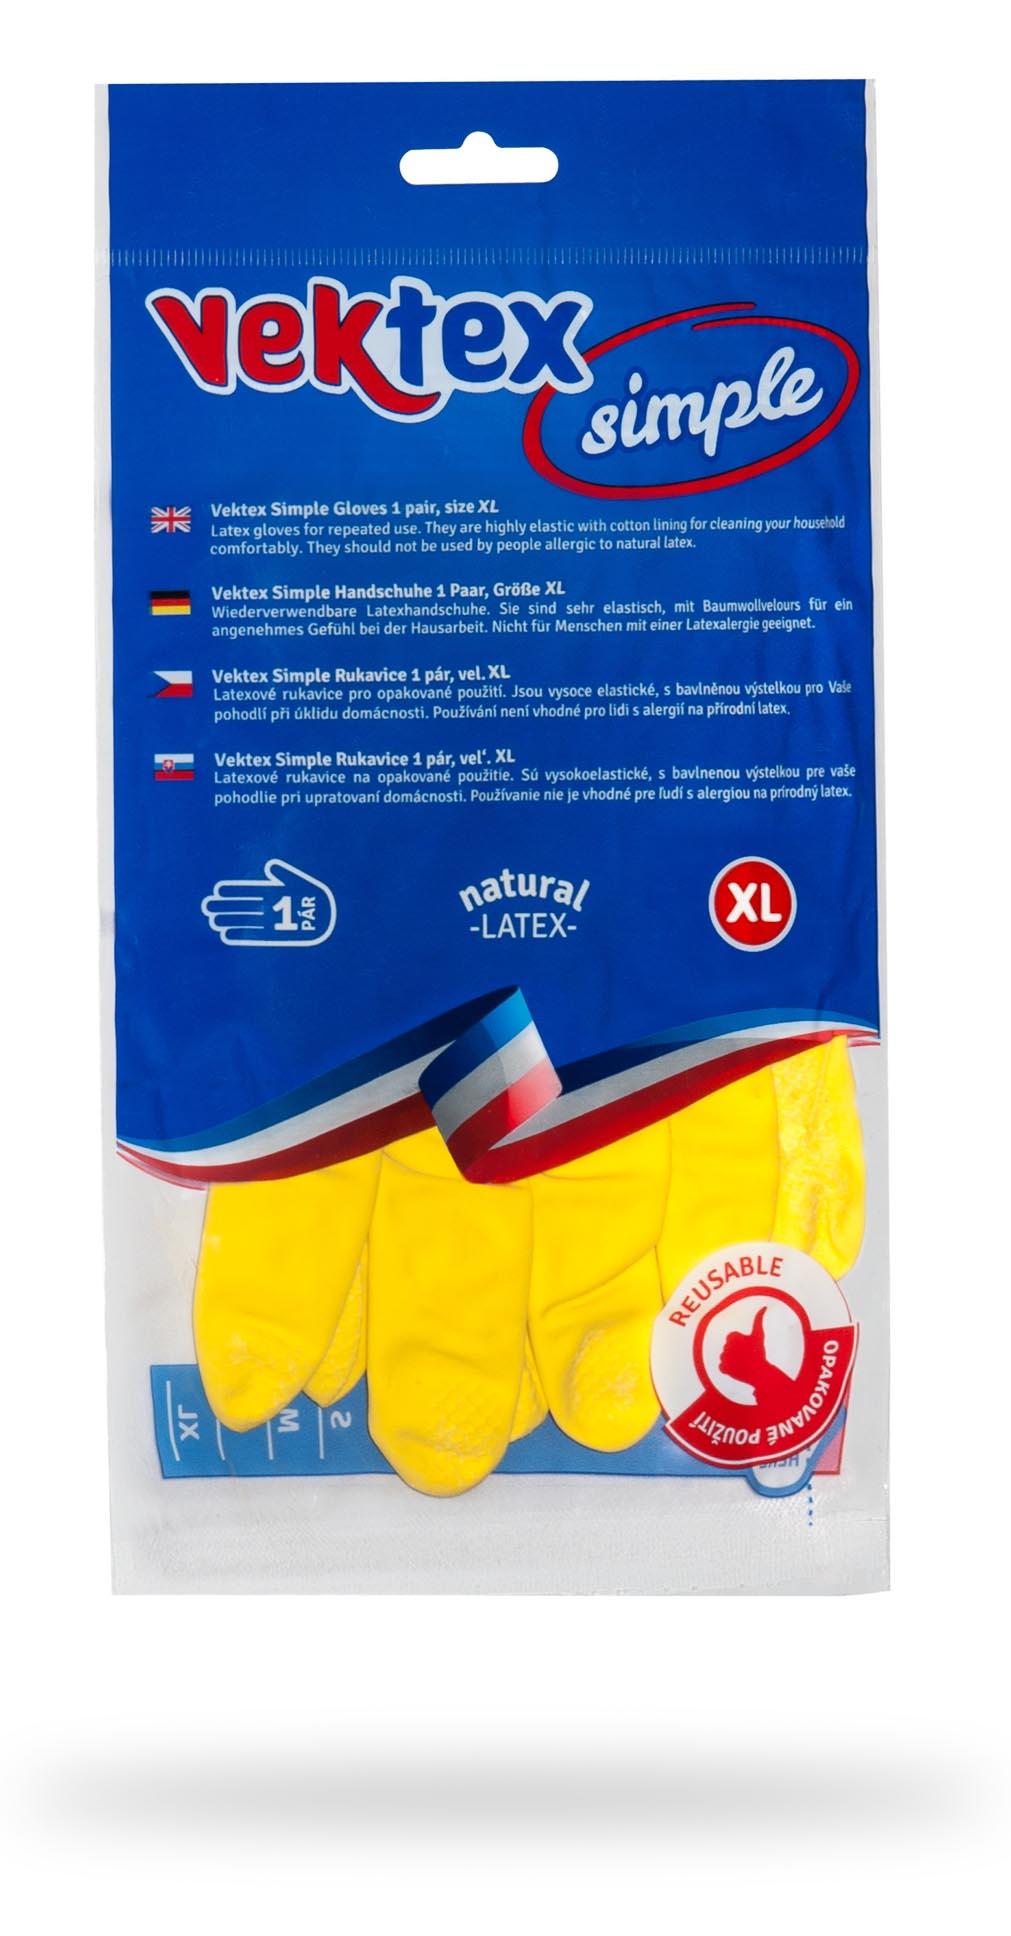 Vektex Simple rukavice vel. XL, 1 pár